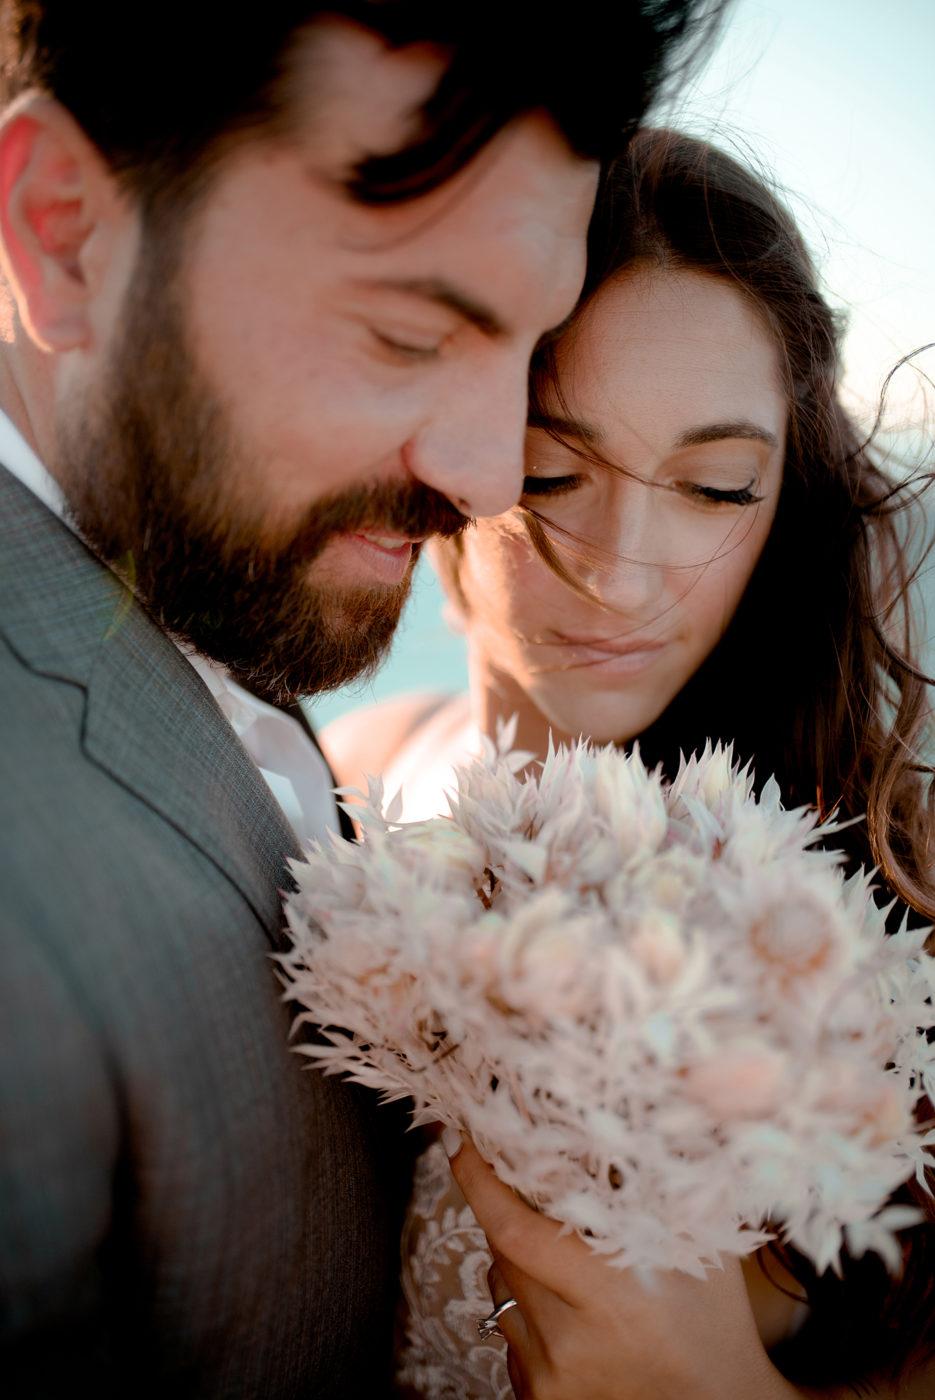 kirill-samarits-wedding-photography-koufonisia-greece-couple-photographer (13)